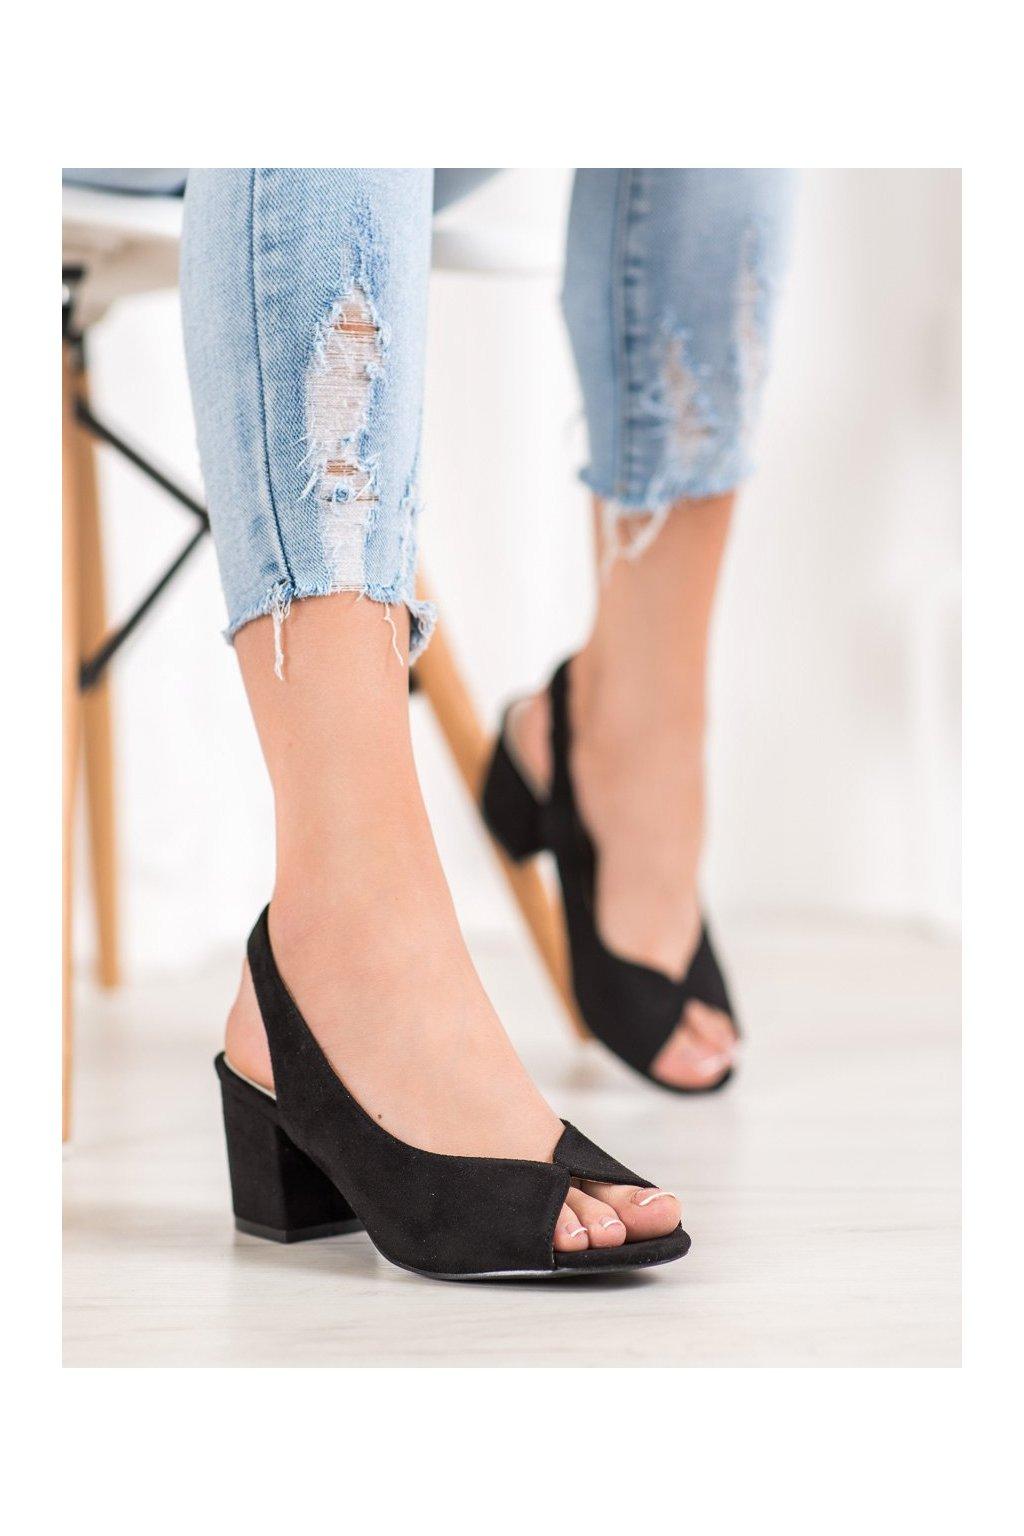 Čierne sandále Filippo kod DS1277/20B